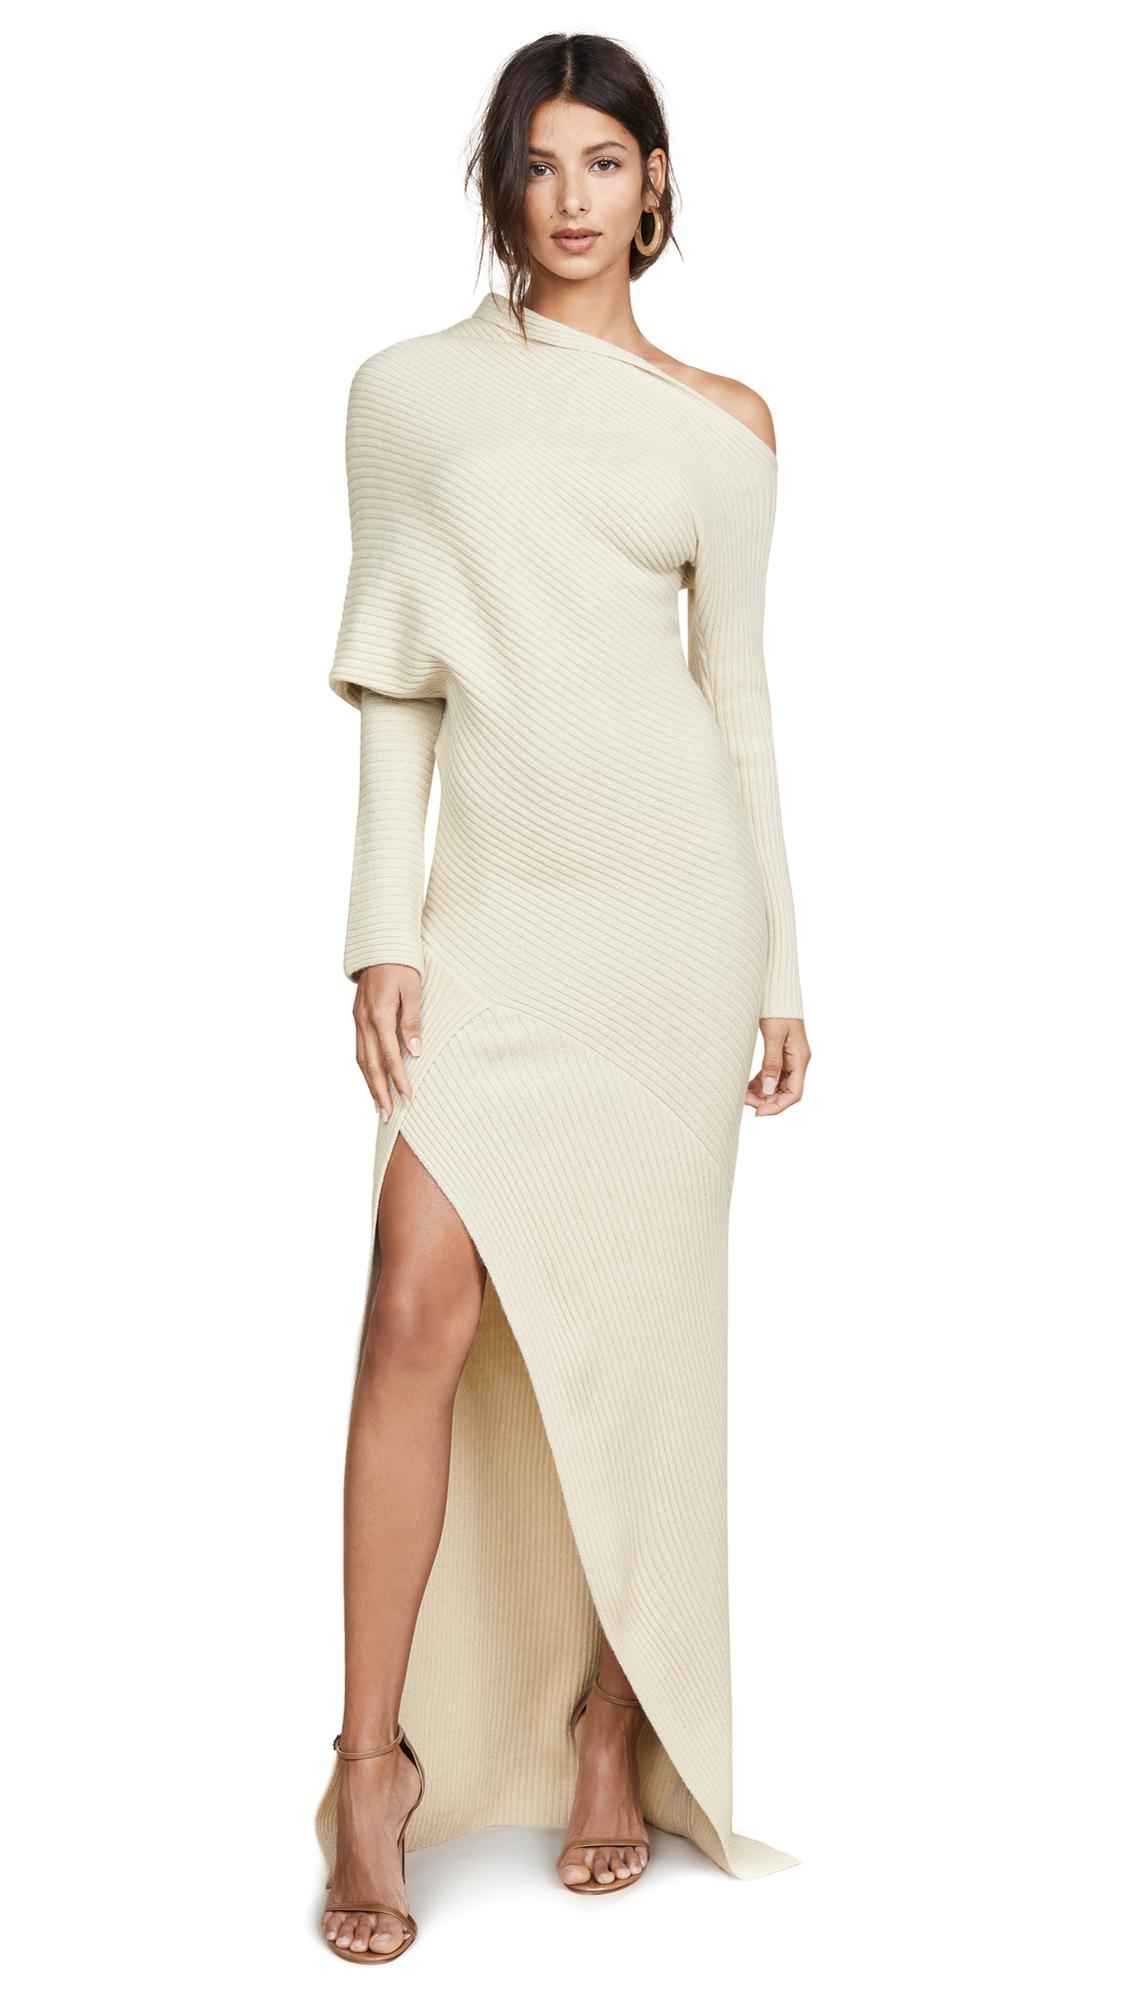 Roberto Cavalli One Shoulder Long Sleeve Knit Dress In Ecru